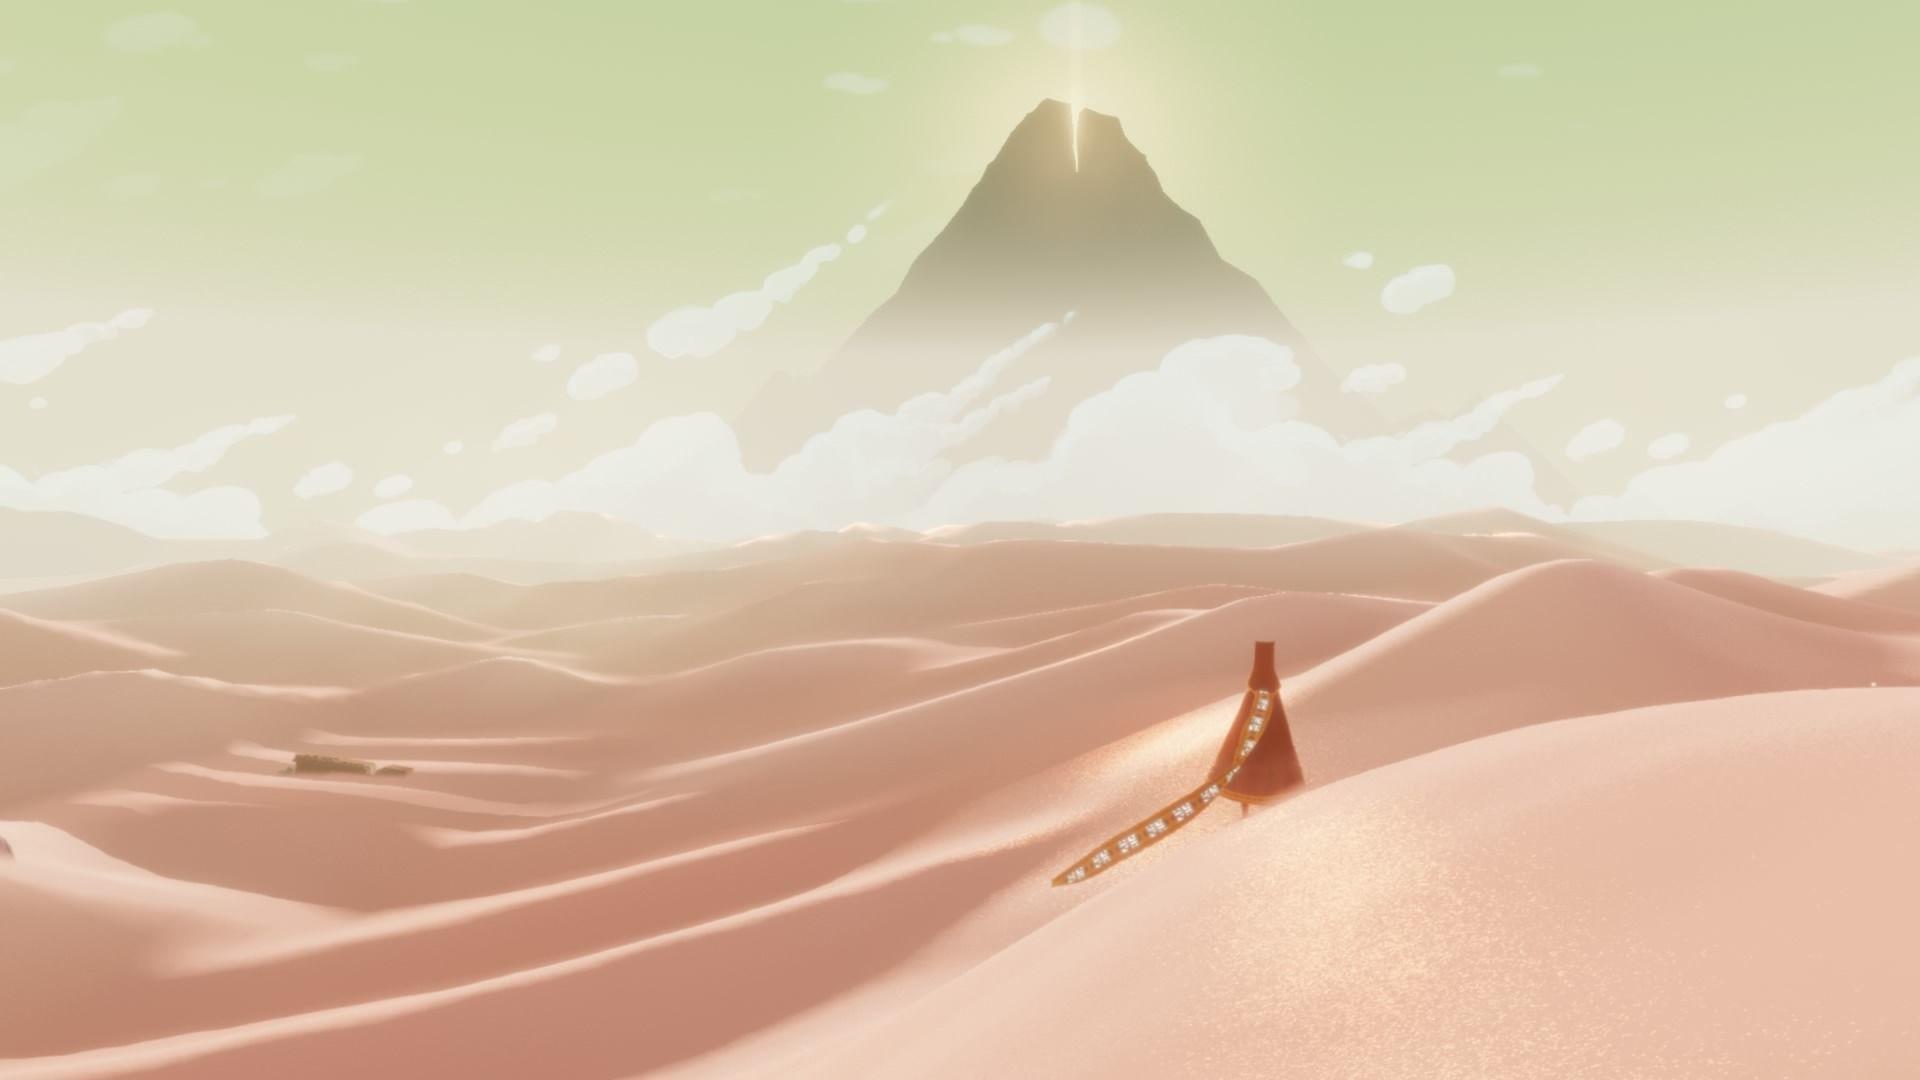 Journey Screenshots | Journey, Screenshots, Natural landmarks